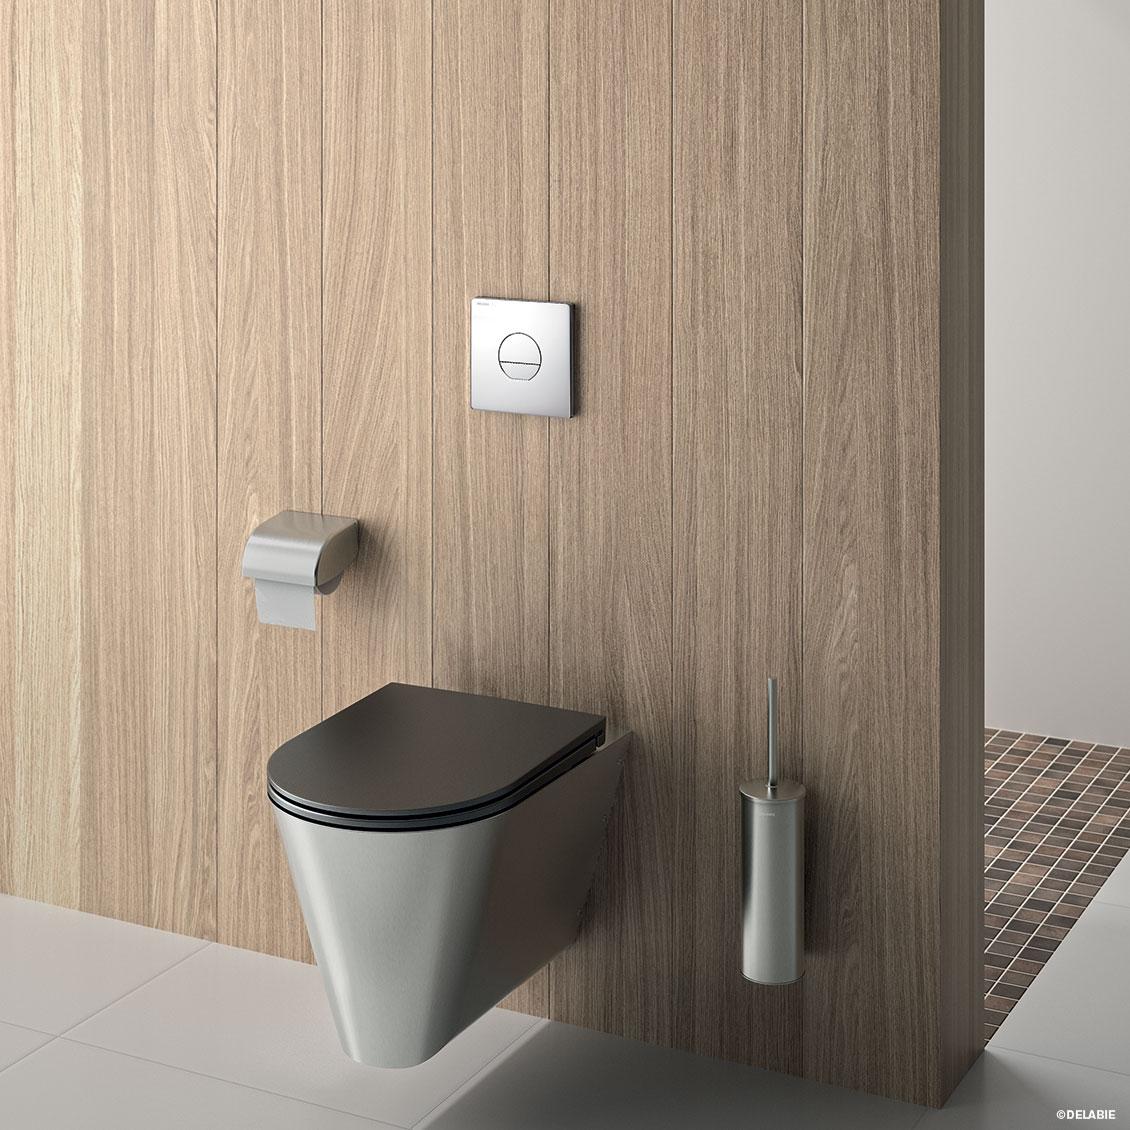 Hotel toilets